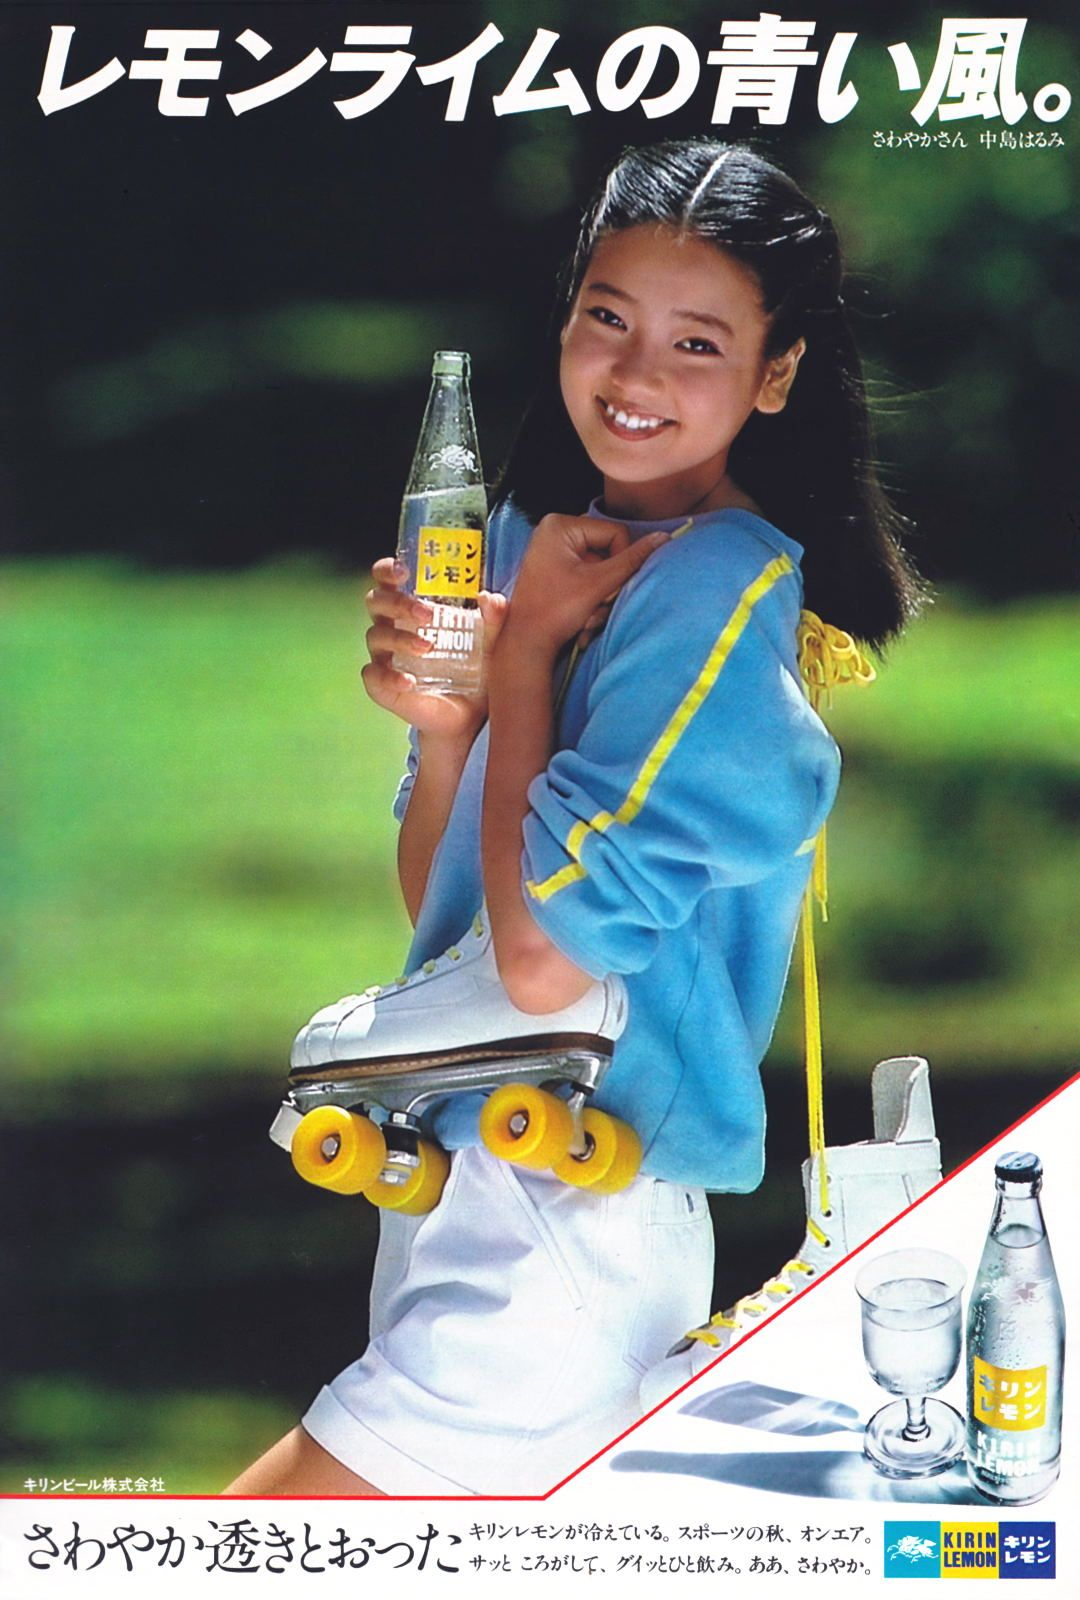 Cm キリン 女の子 レモン